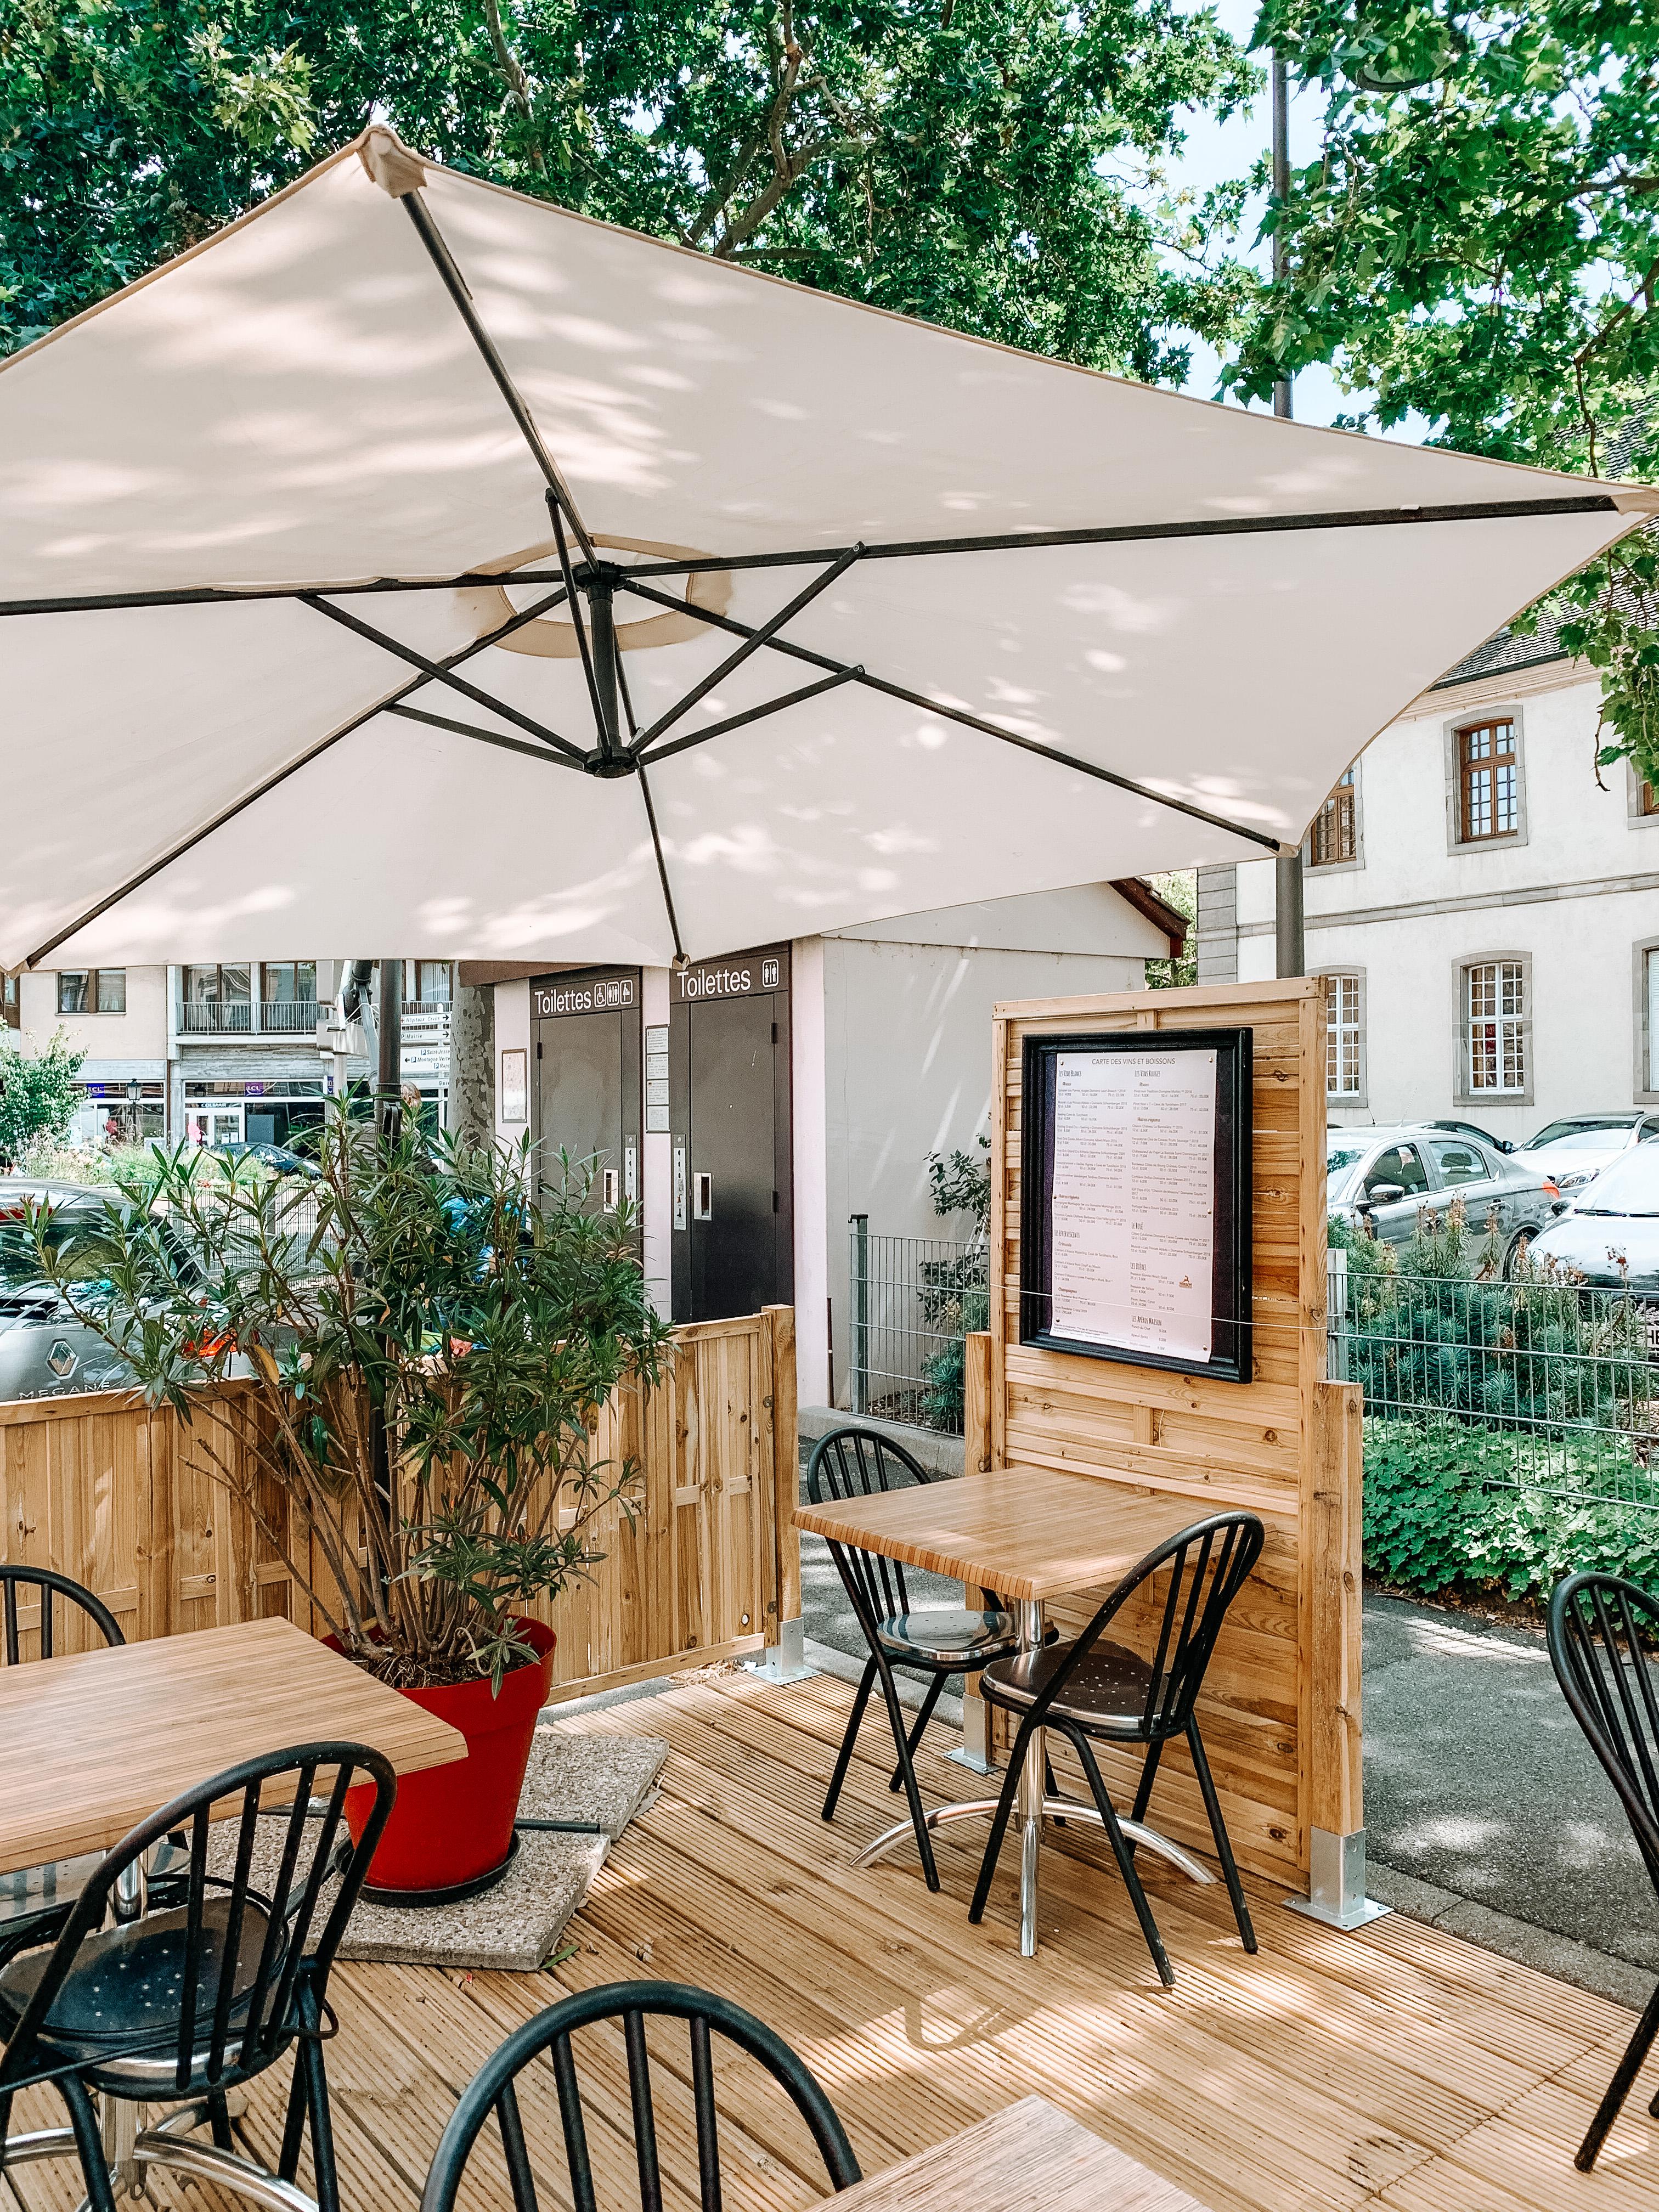 Où manger en terrasse à colmar ?